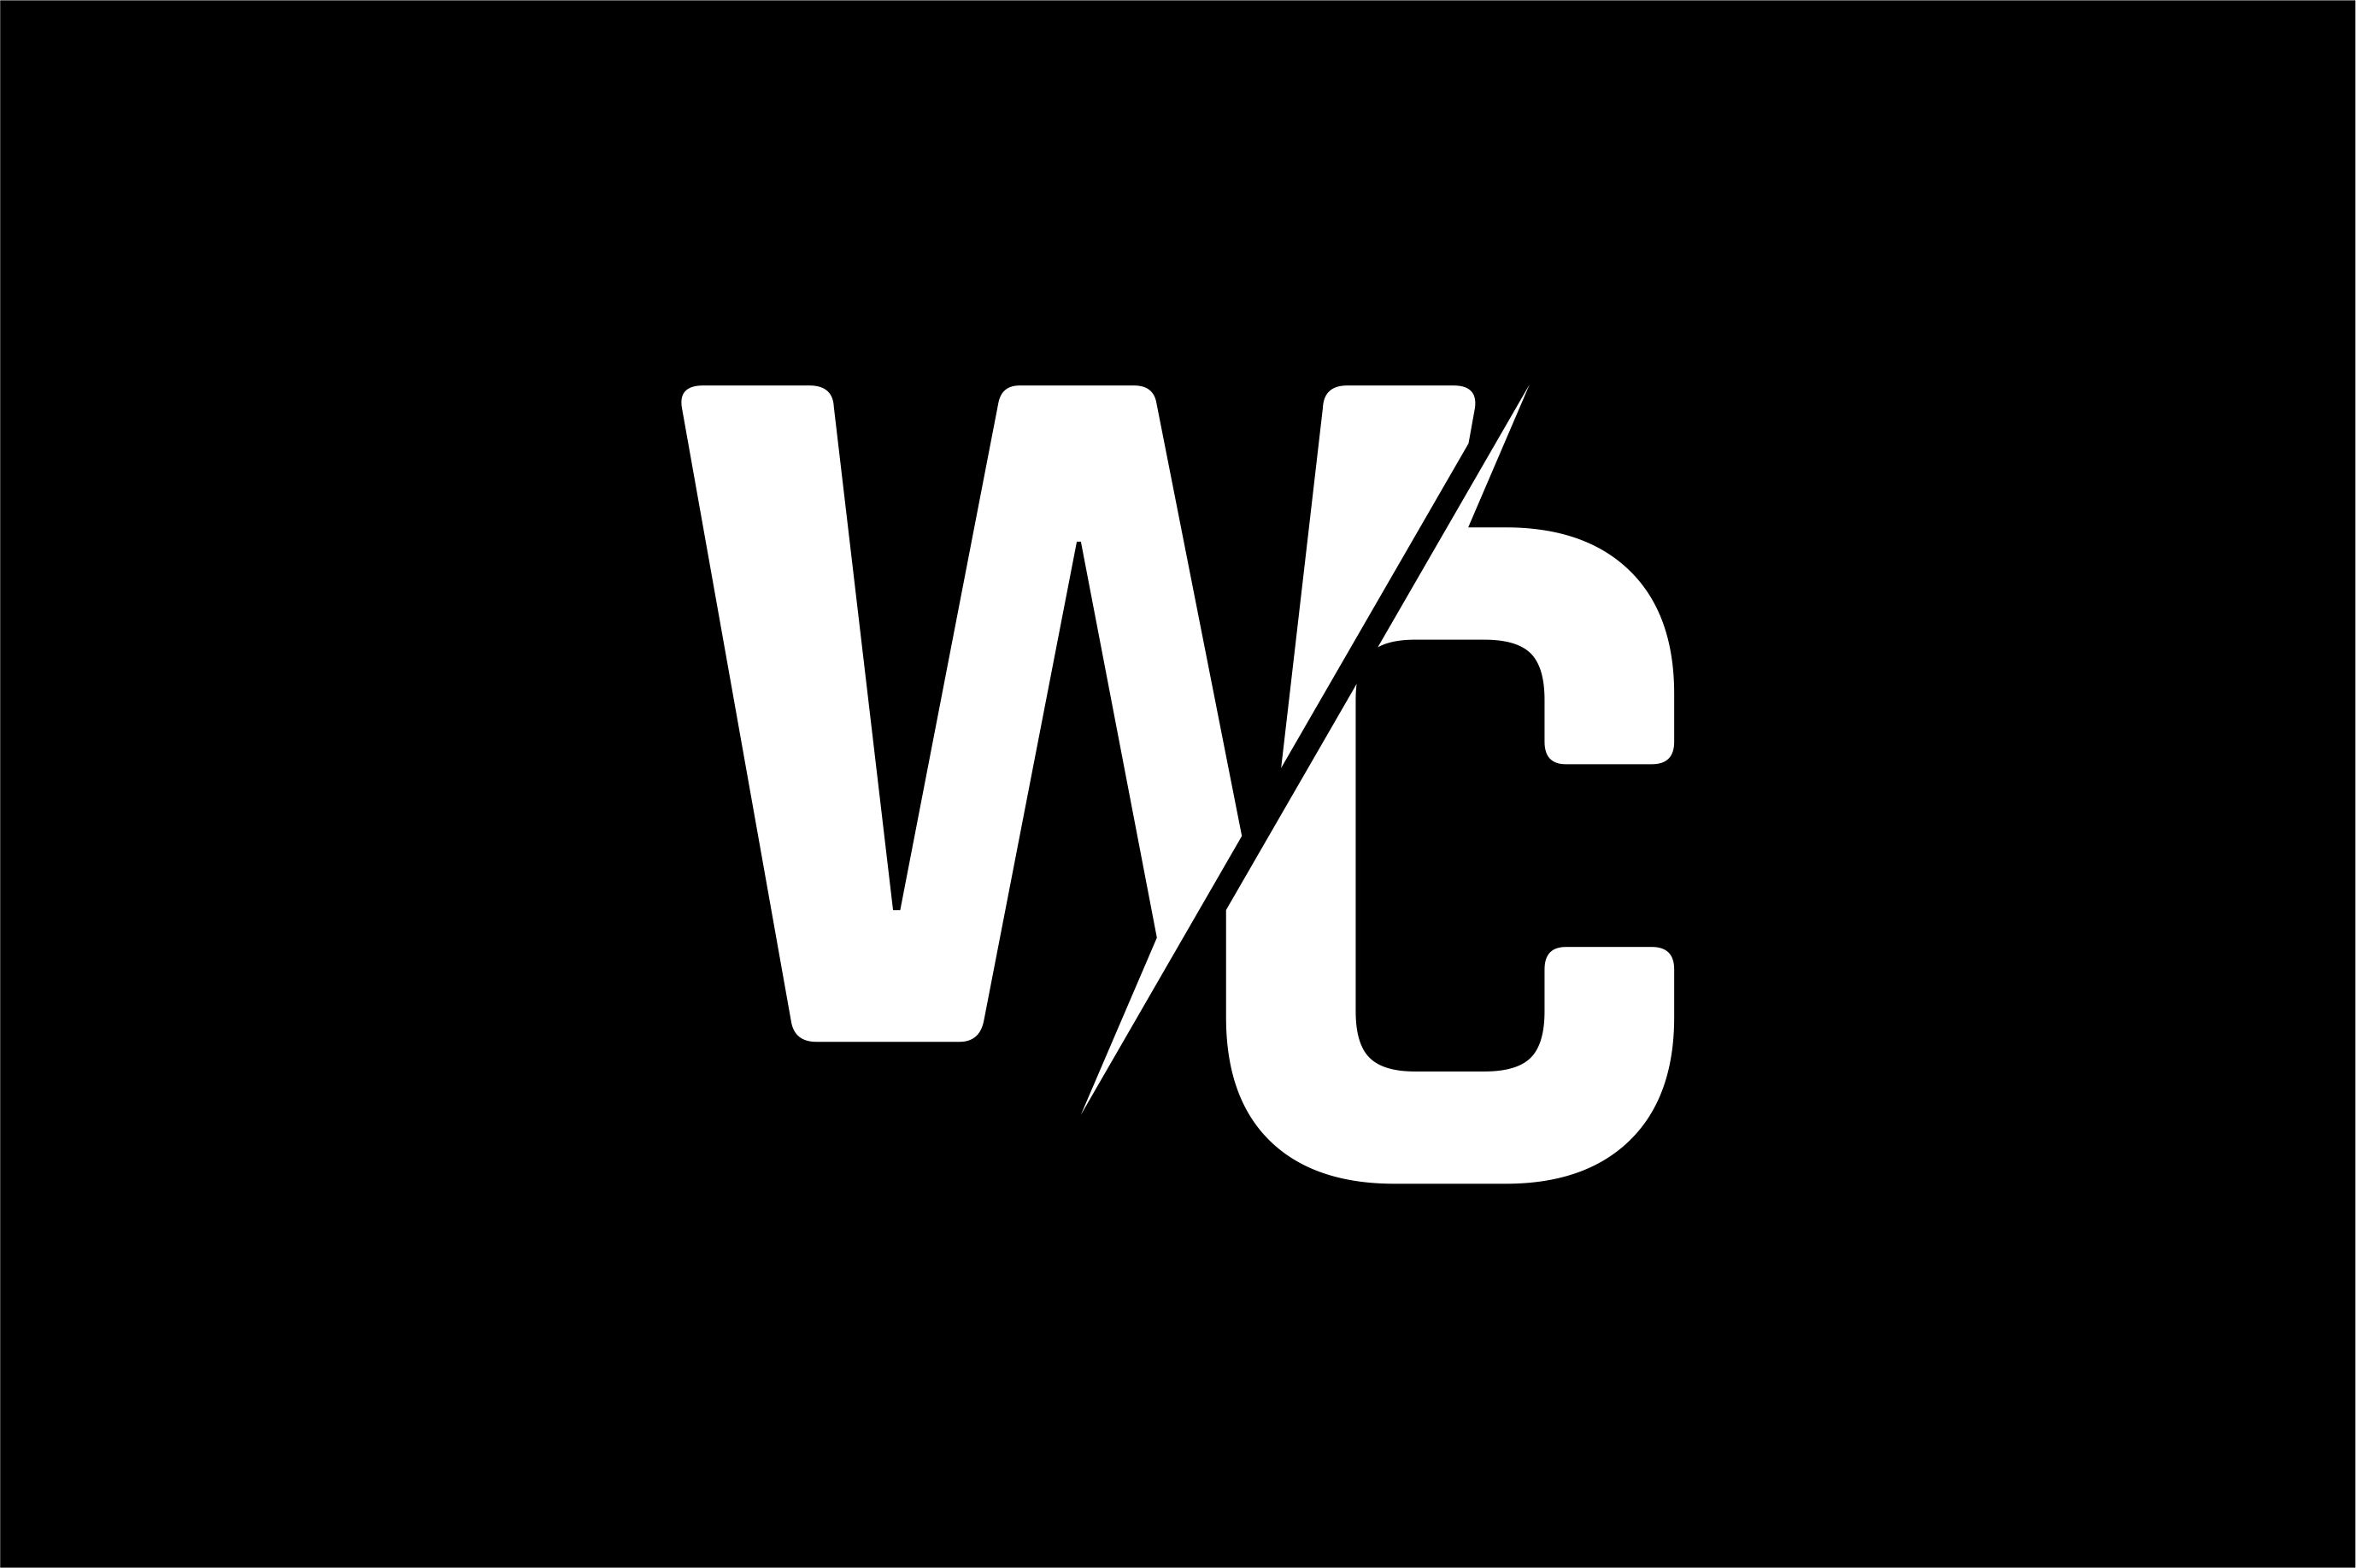 Monogram Wc Logo Design Graphic By Greenlines Studios Creative Fabrica Fabrica Catrinas Tatuajes